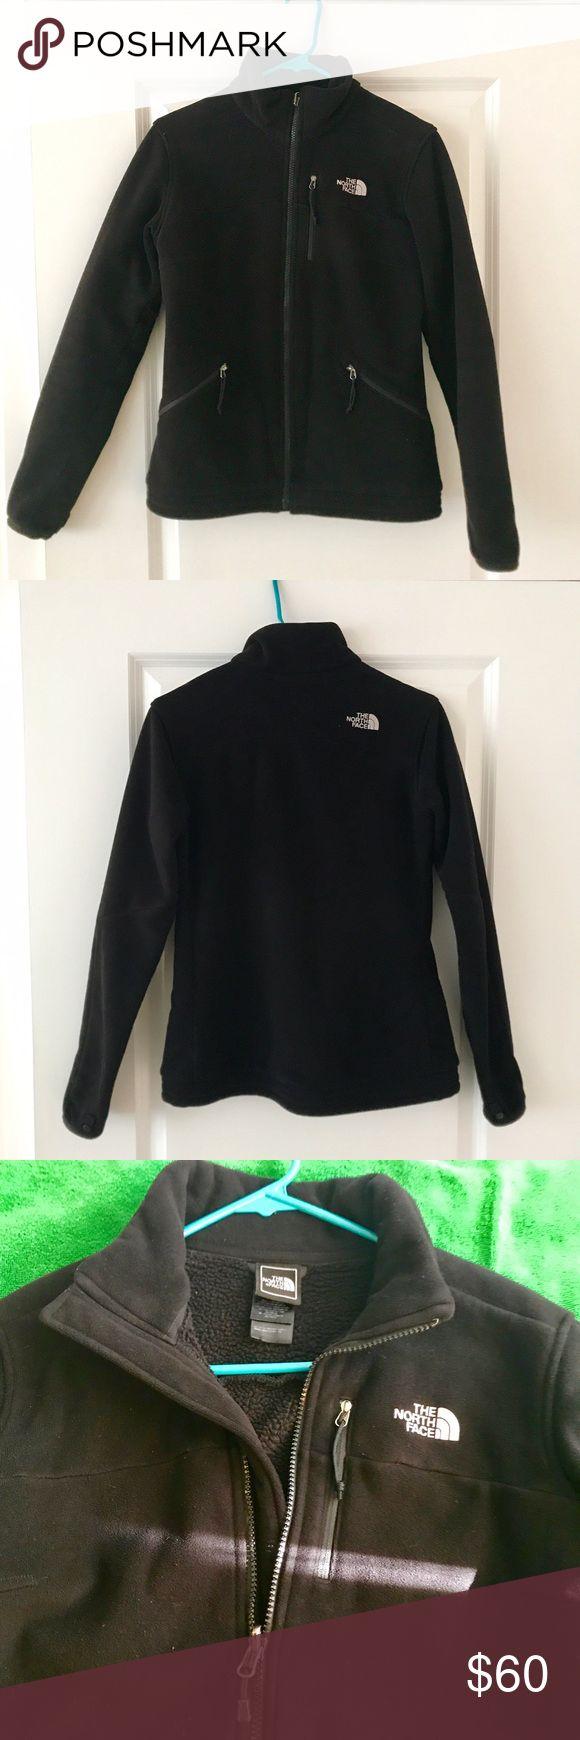 North Face black fleece jacket for sale Black north face fleece jacket for sale. In great condition. North Face Jackets & Coats